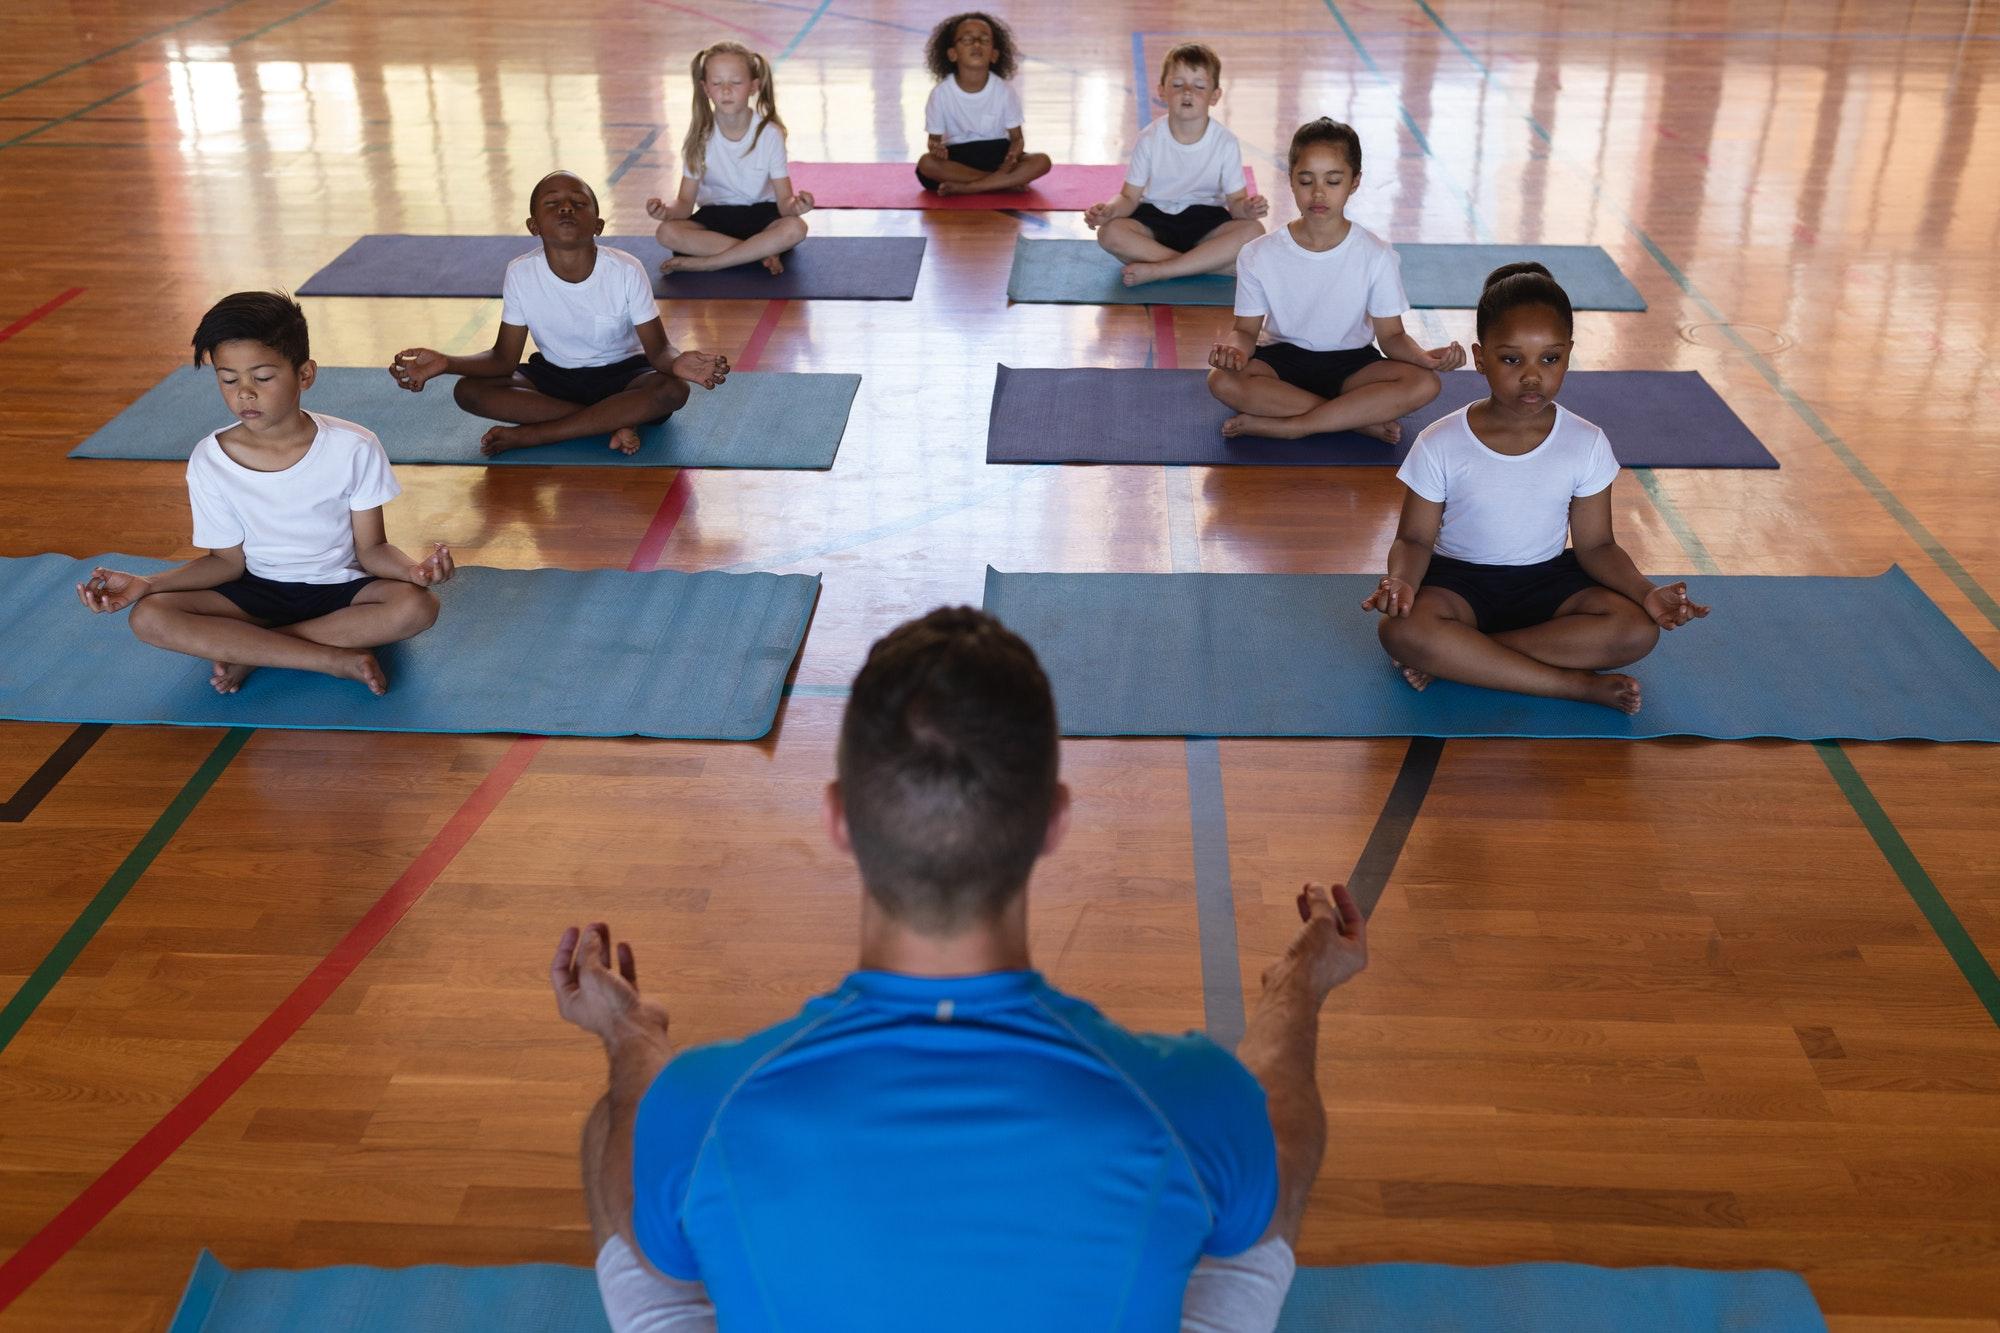 Yoga teacher teaching yoga to school kids in school